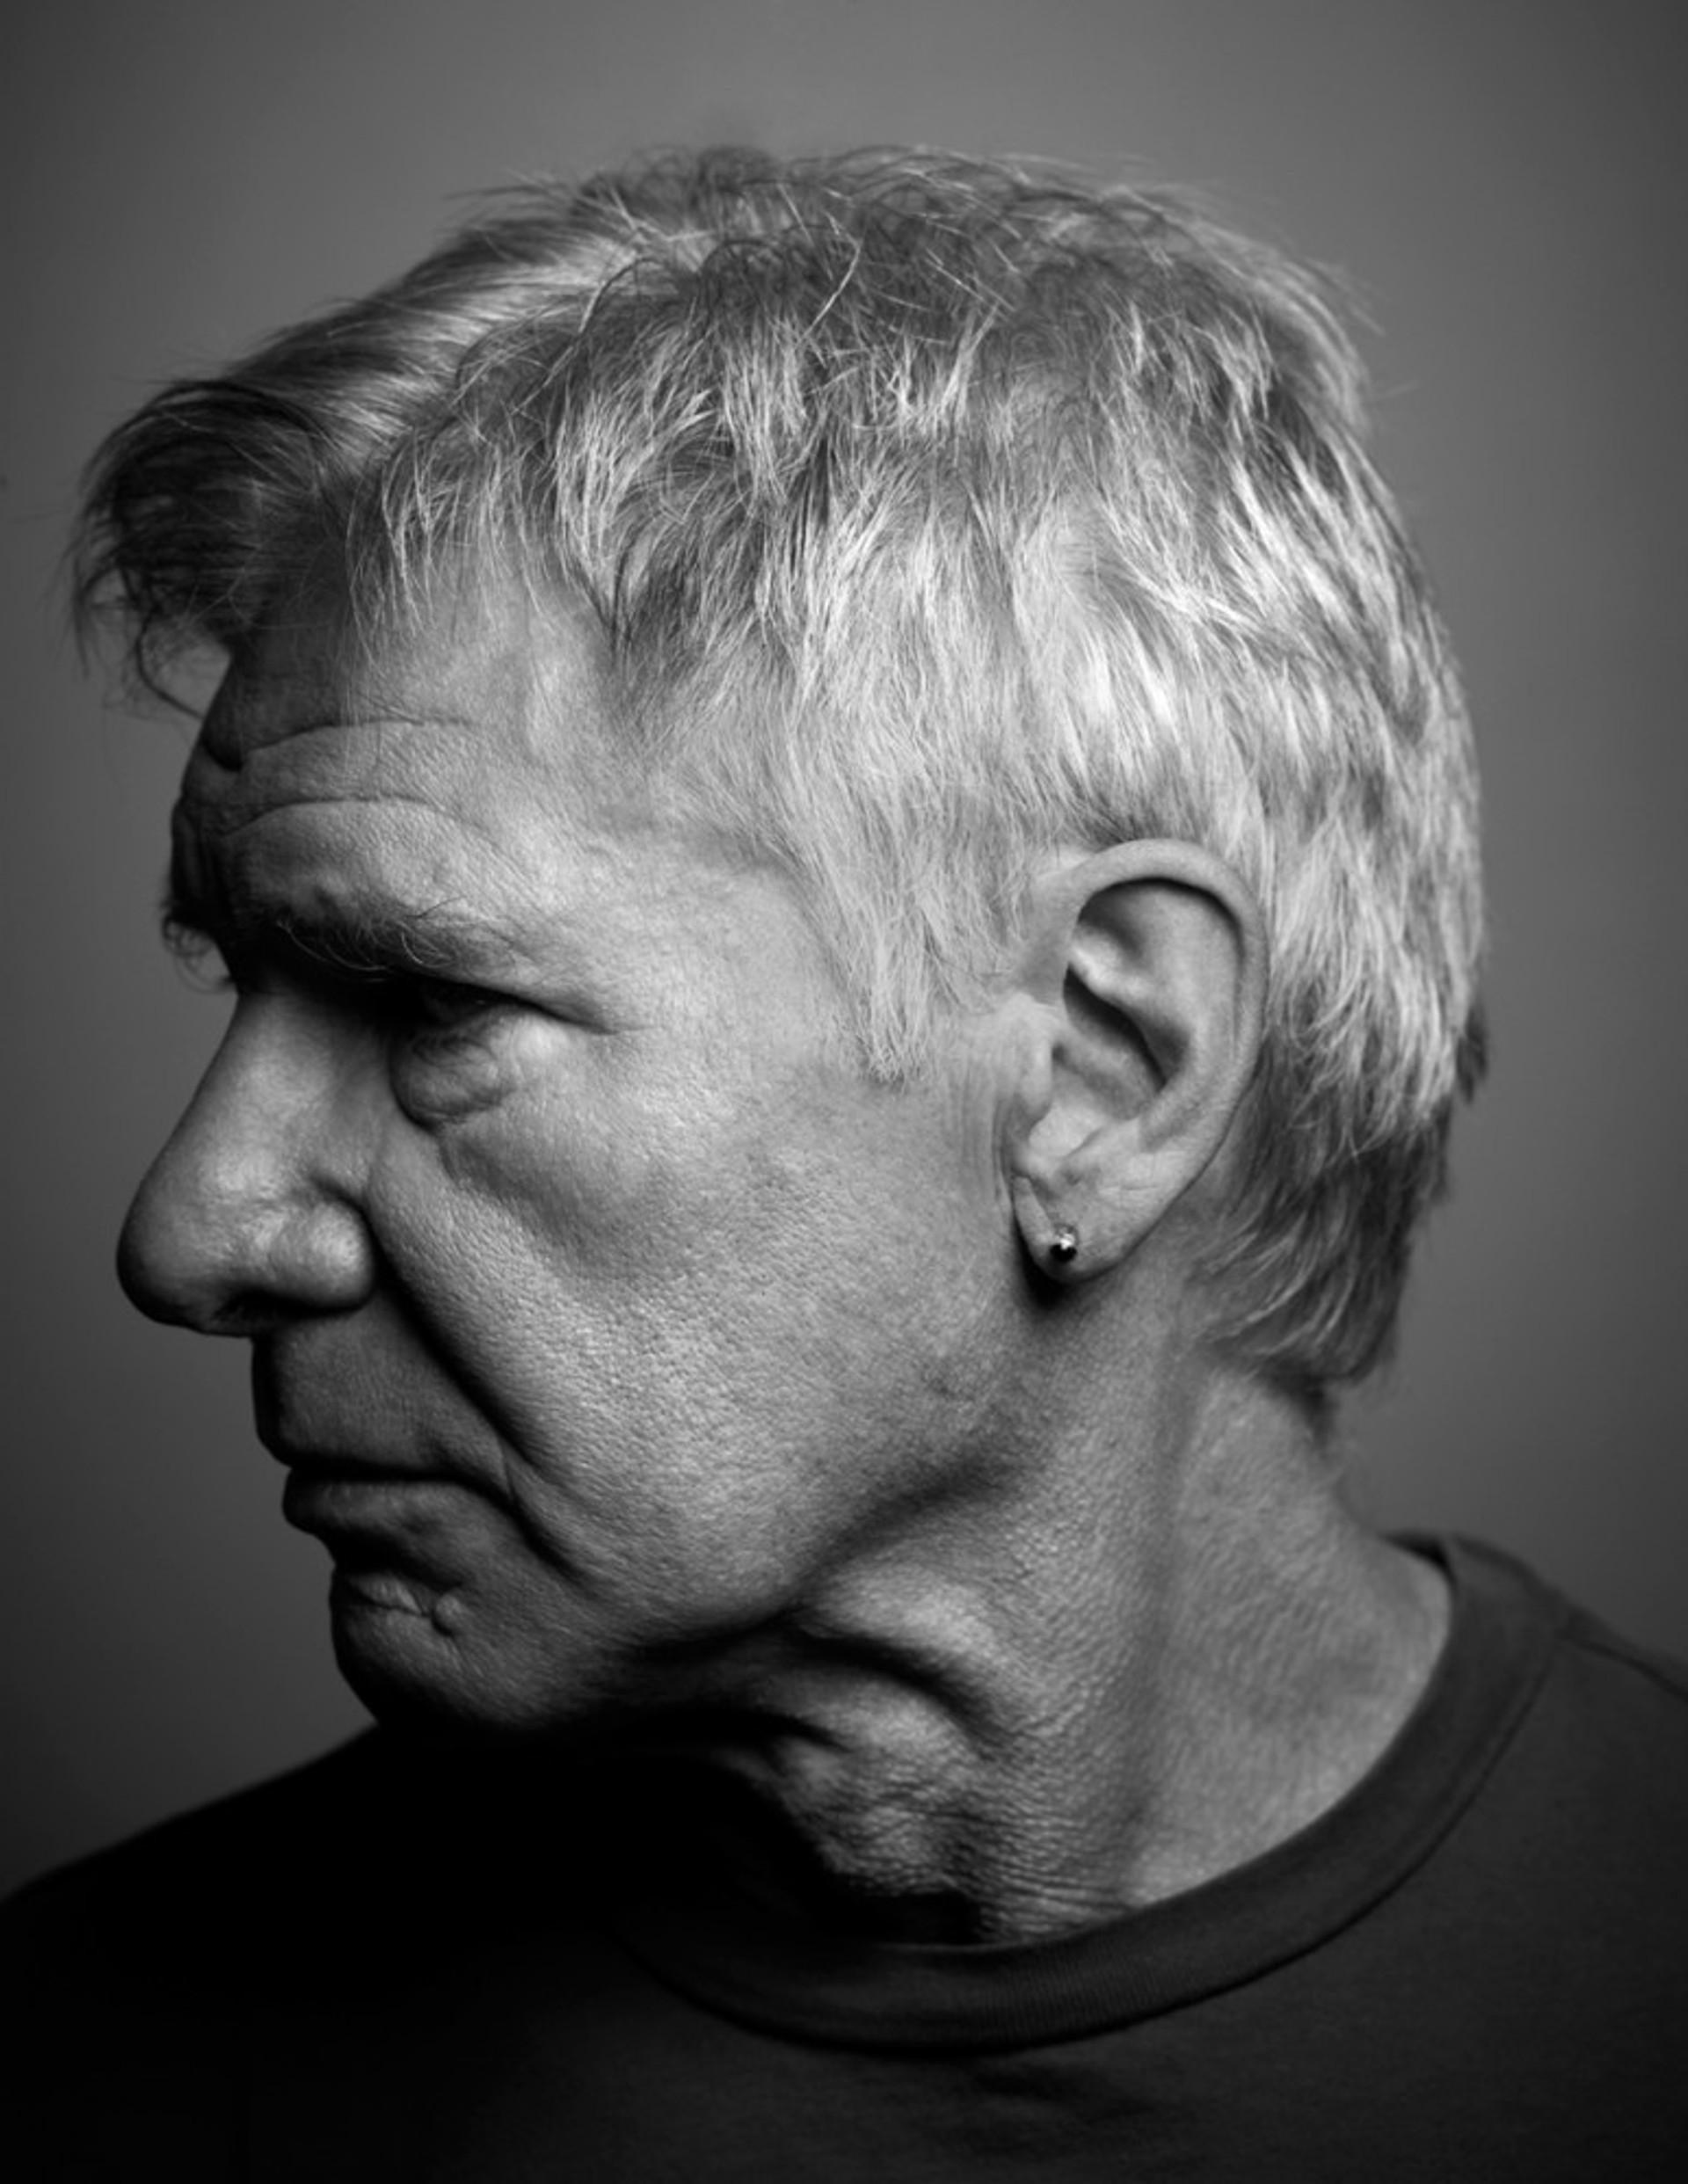 11012 Harrison Ford Profile Headshot, BW by Timothy White